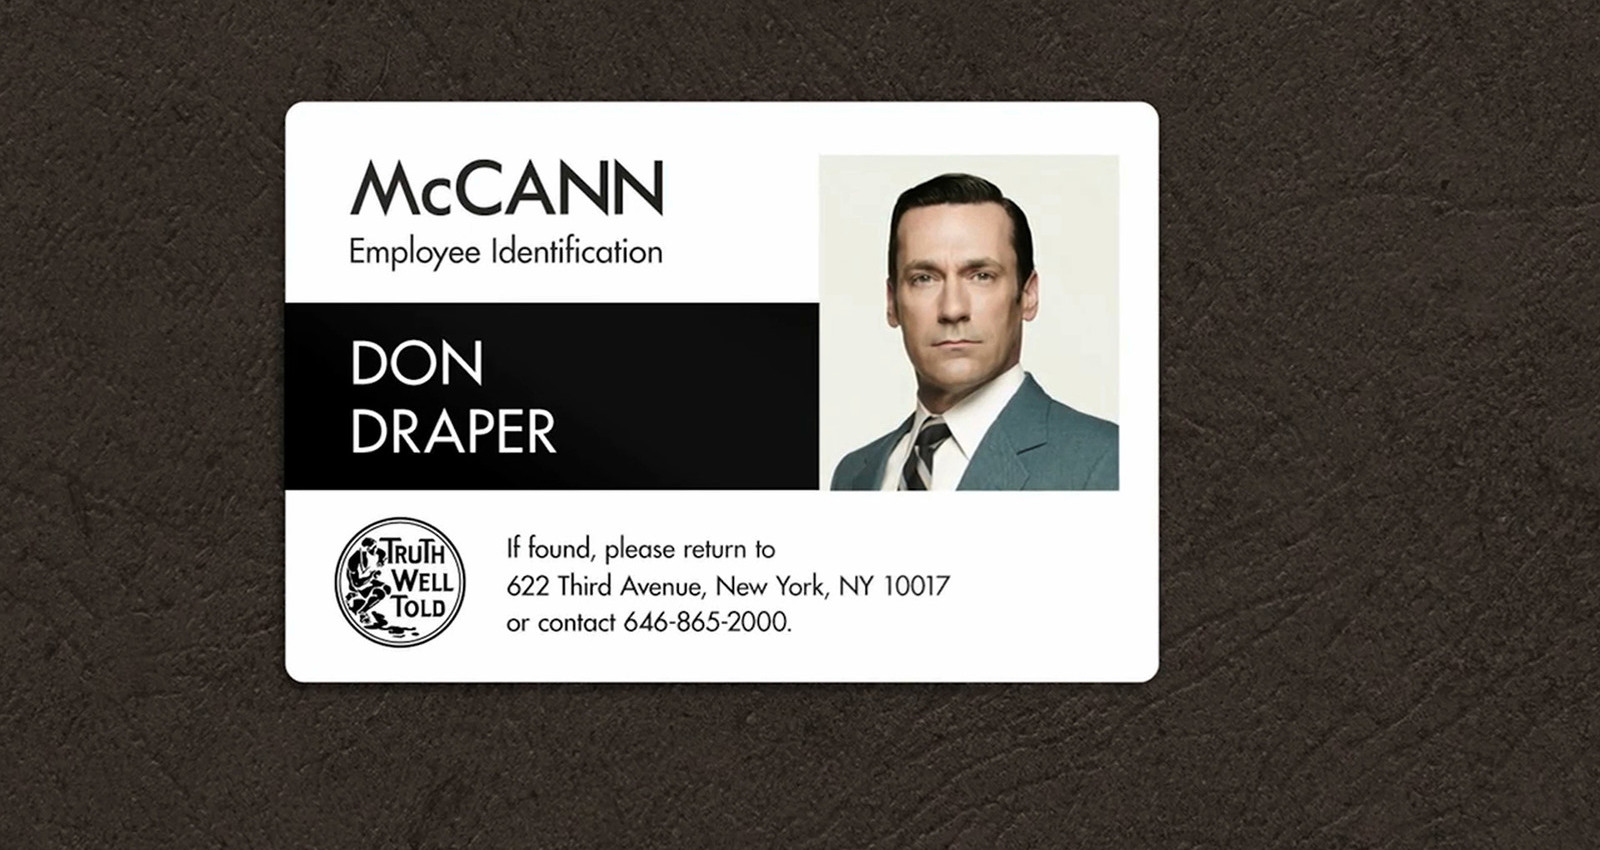 Real McCann vs Mad Men McCann